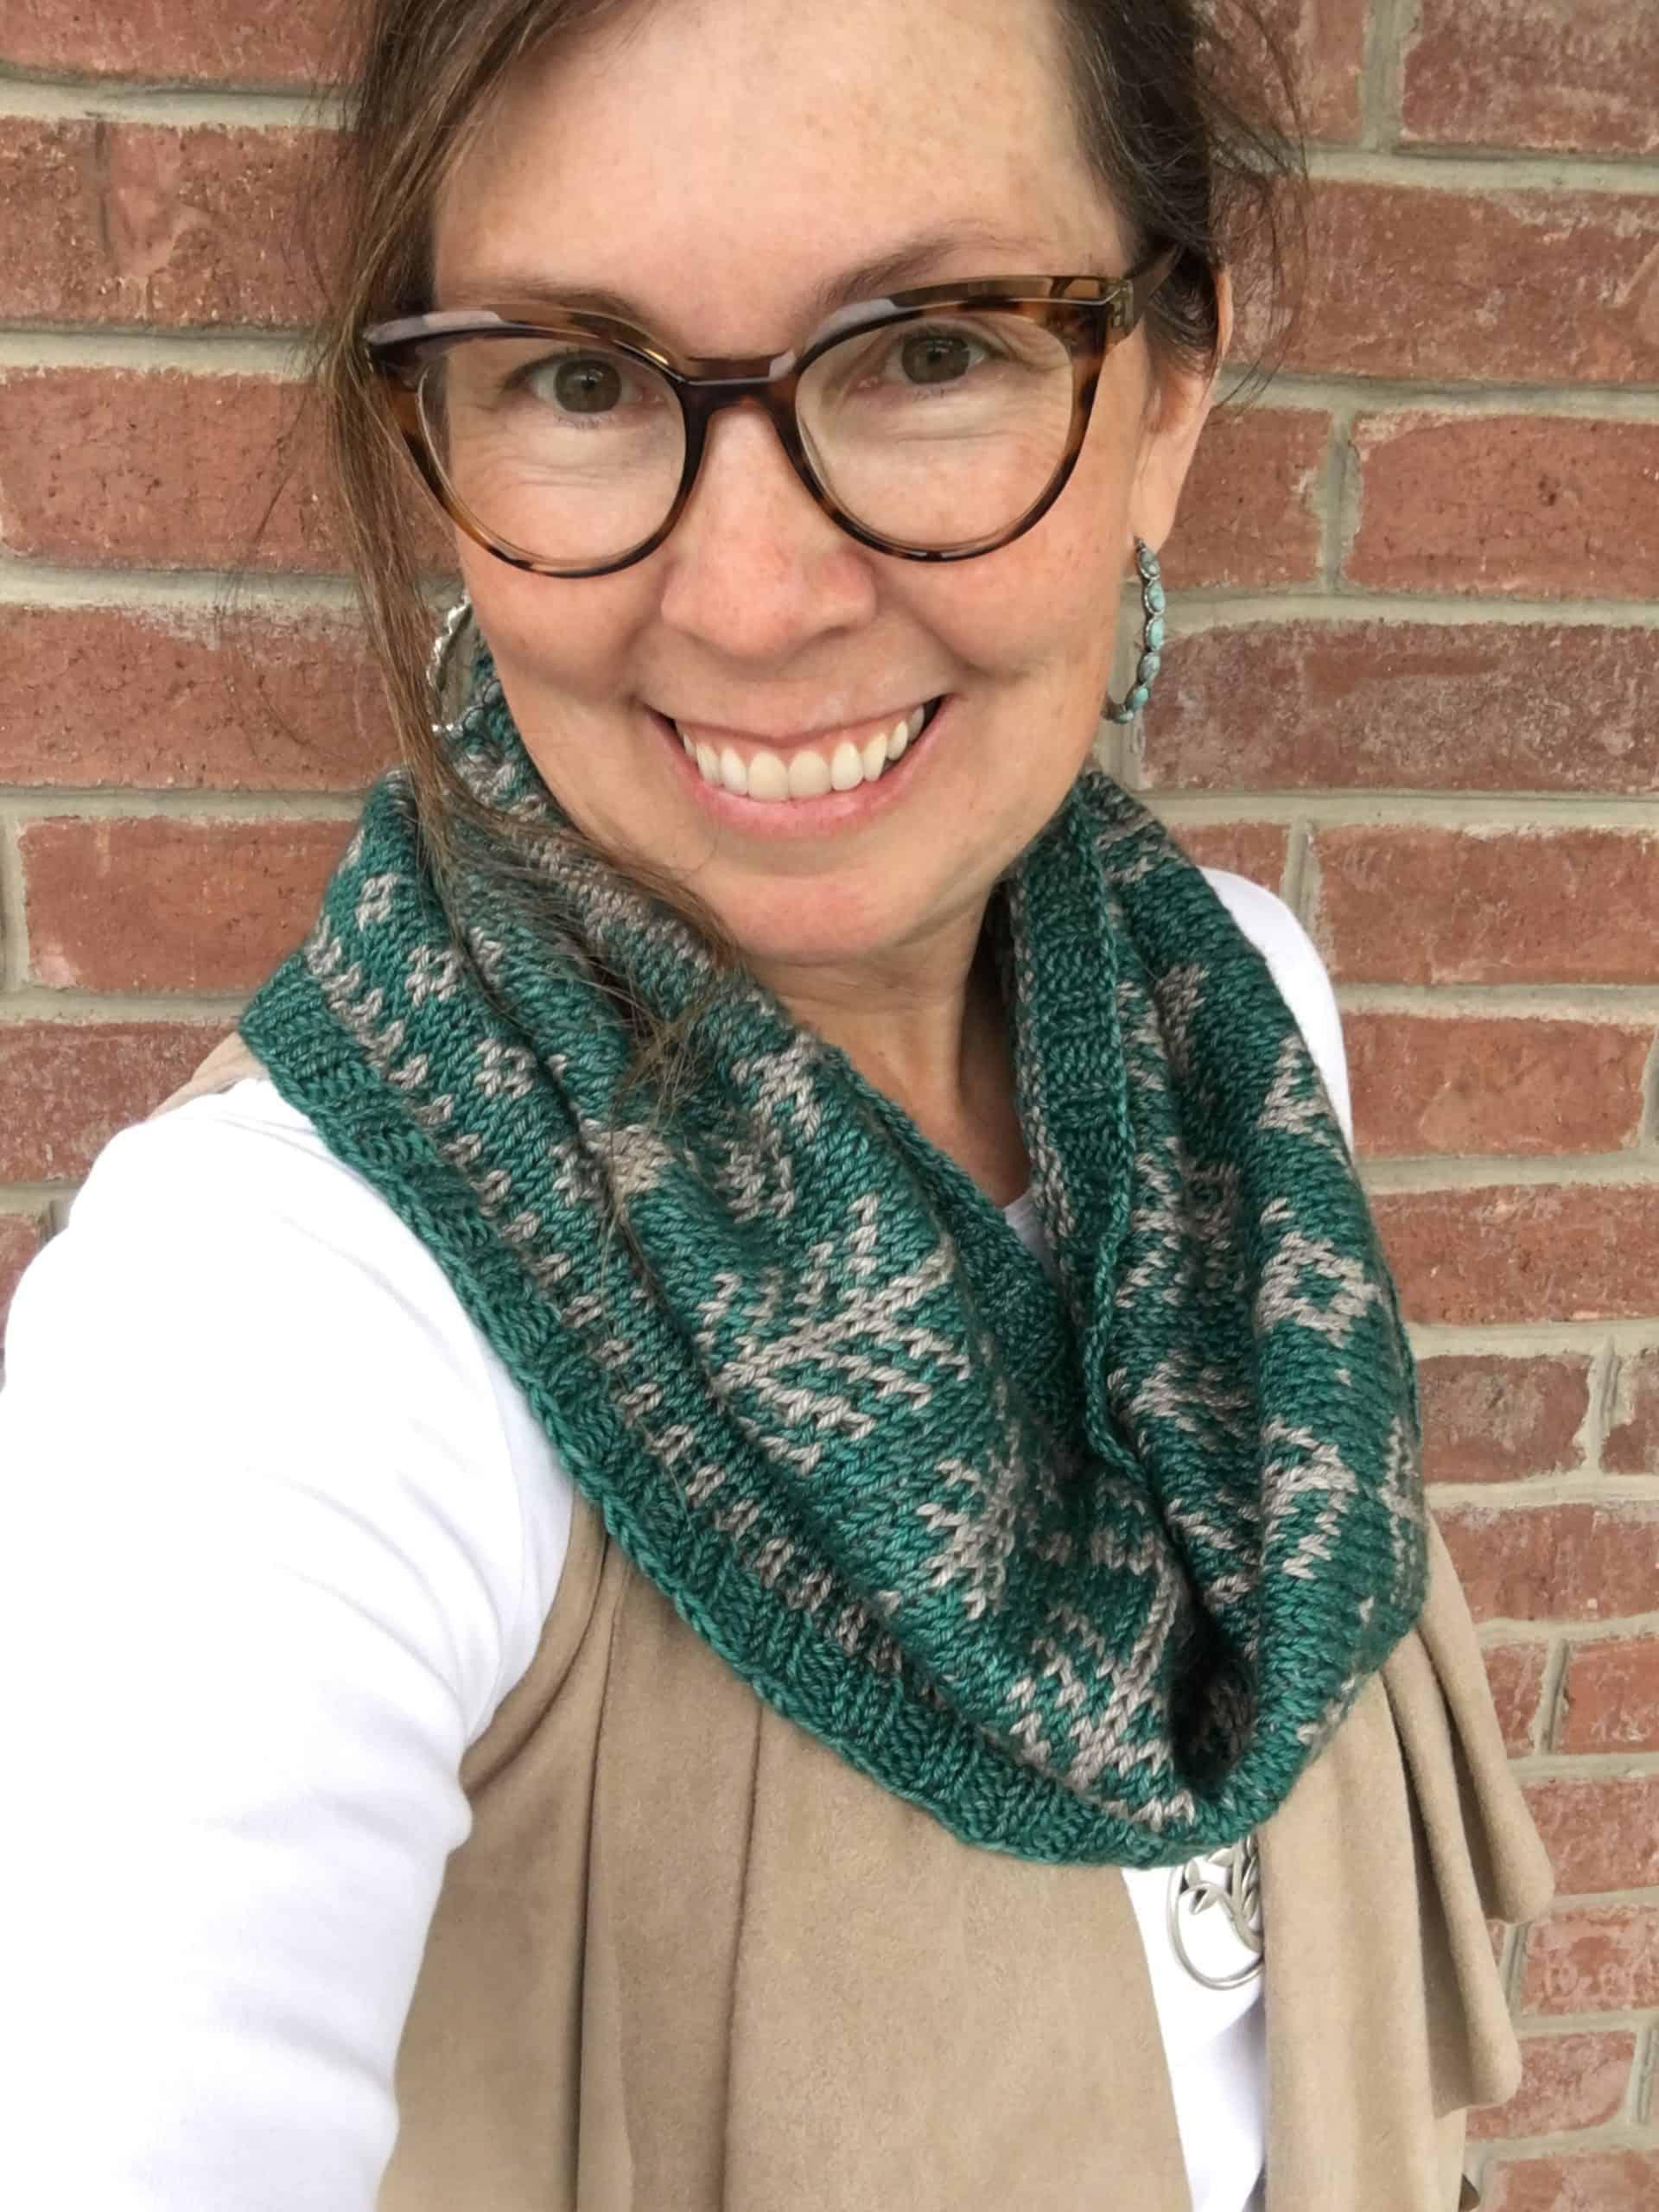 A woman wearing a green knit cowl.